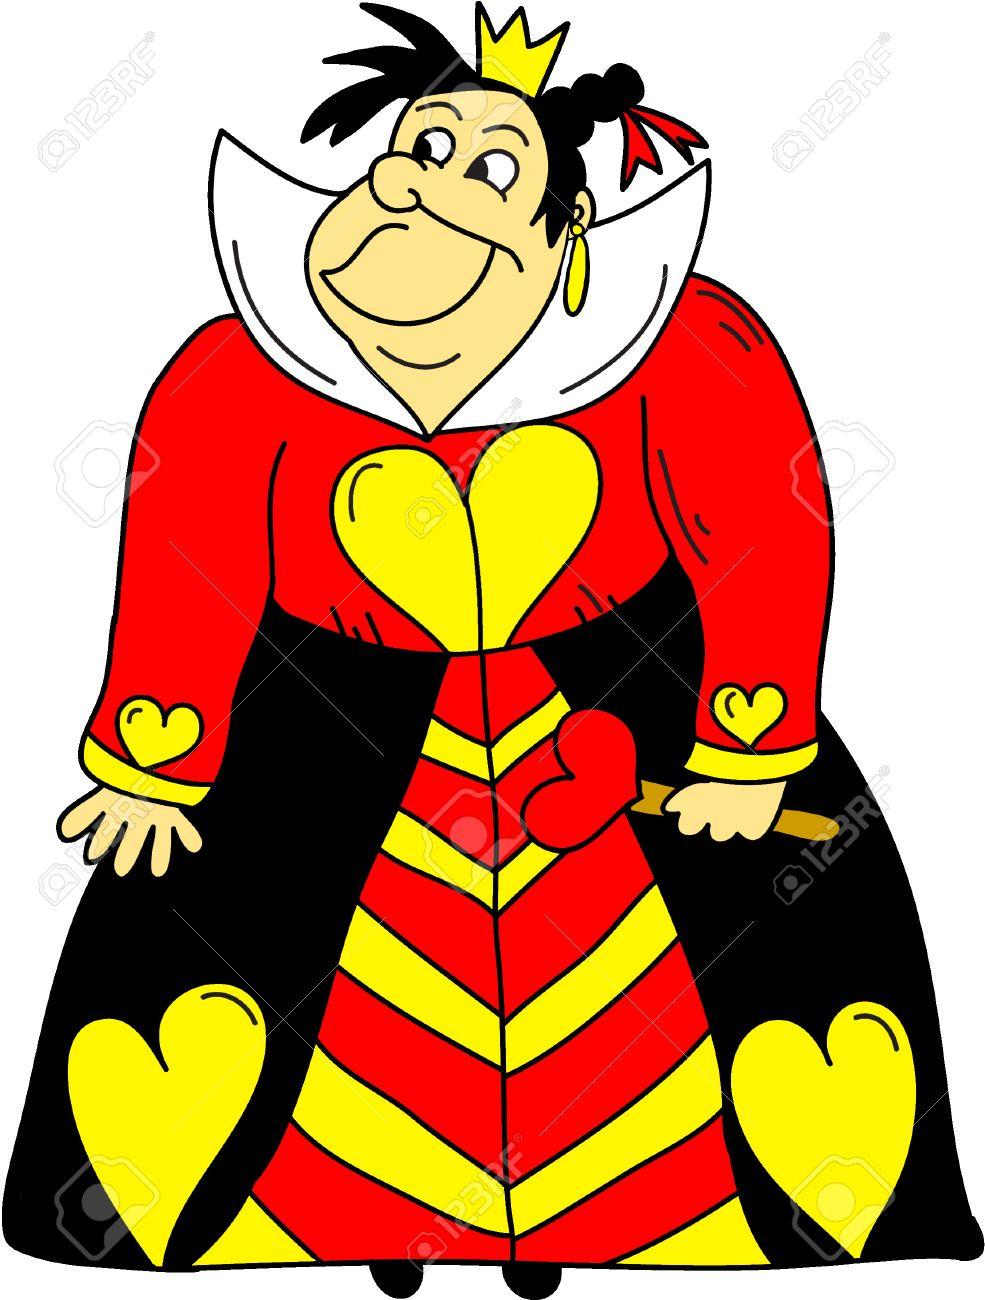 the queen of hearts clipart alice in wonderland cartoons royalty rh 123rf com queen clipart crown queen clipart png